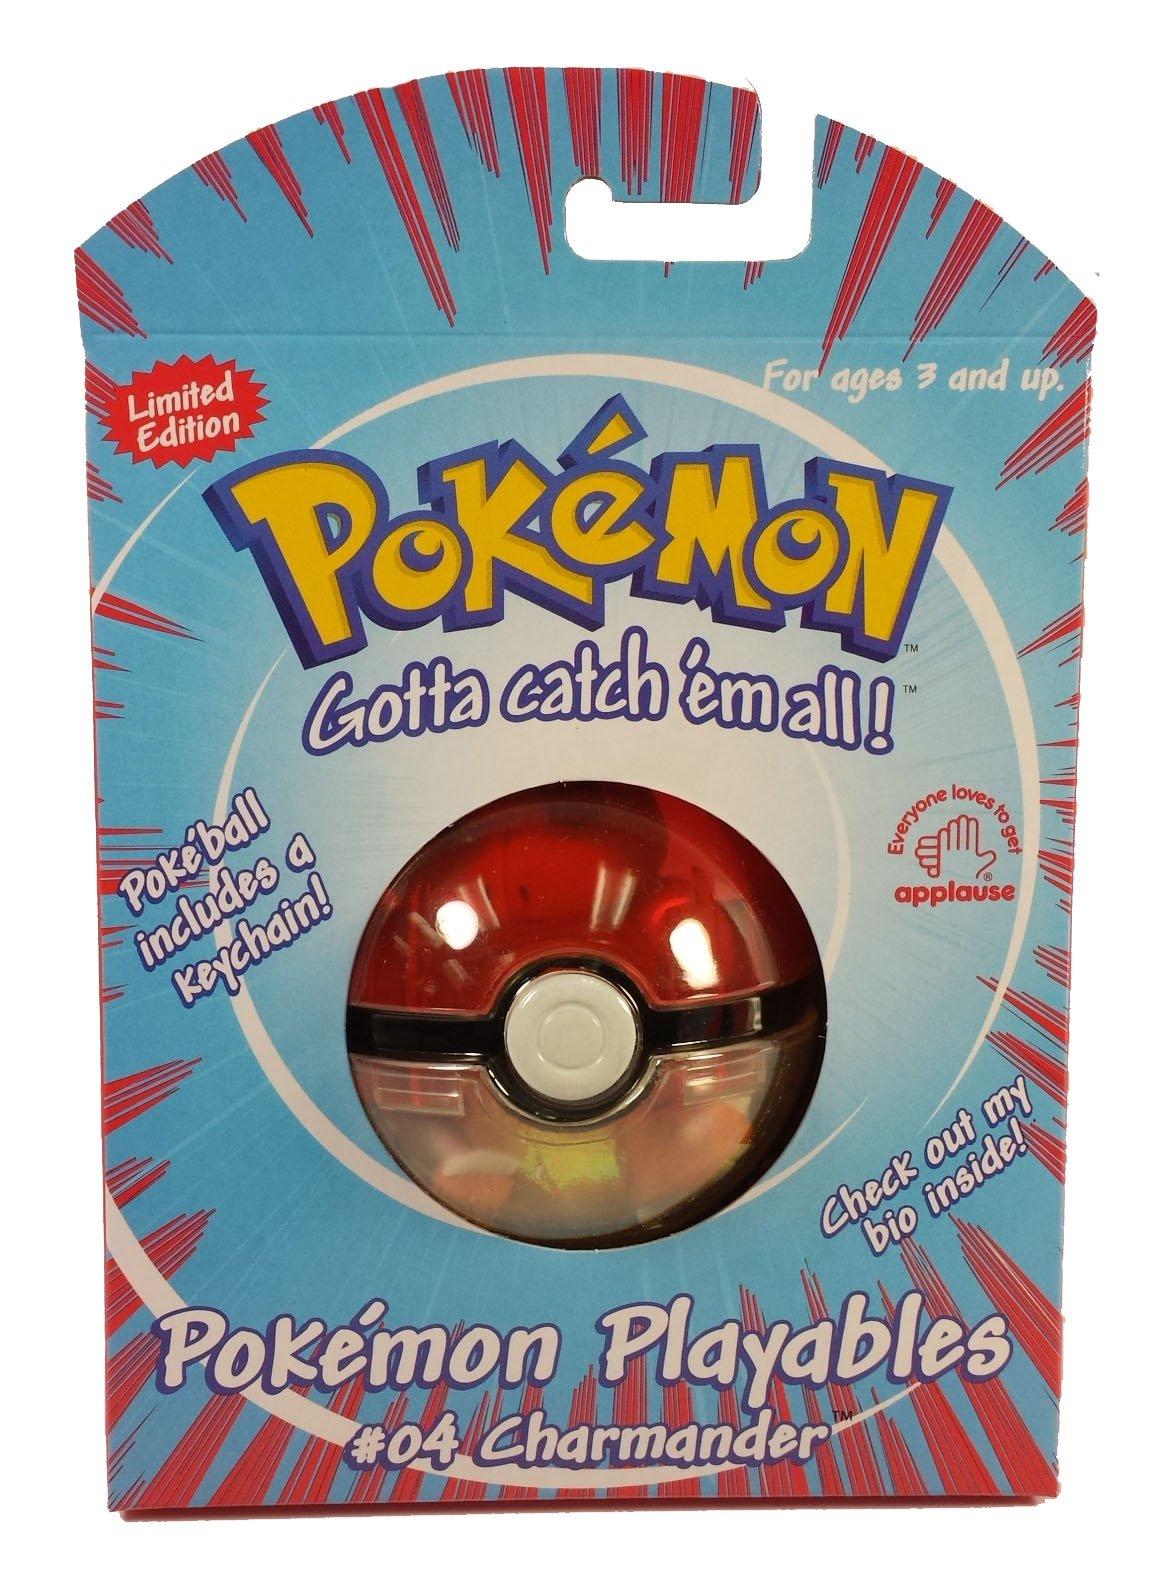 POKEMON Playables #04 Charmander Pokeball with Keychain by Pokemon (Image #1)